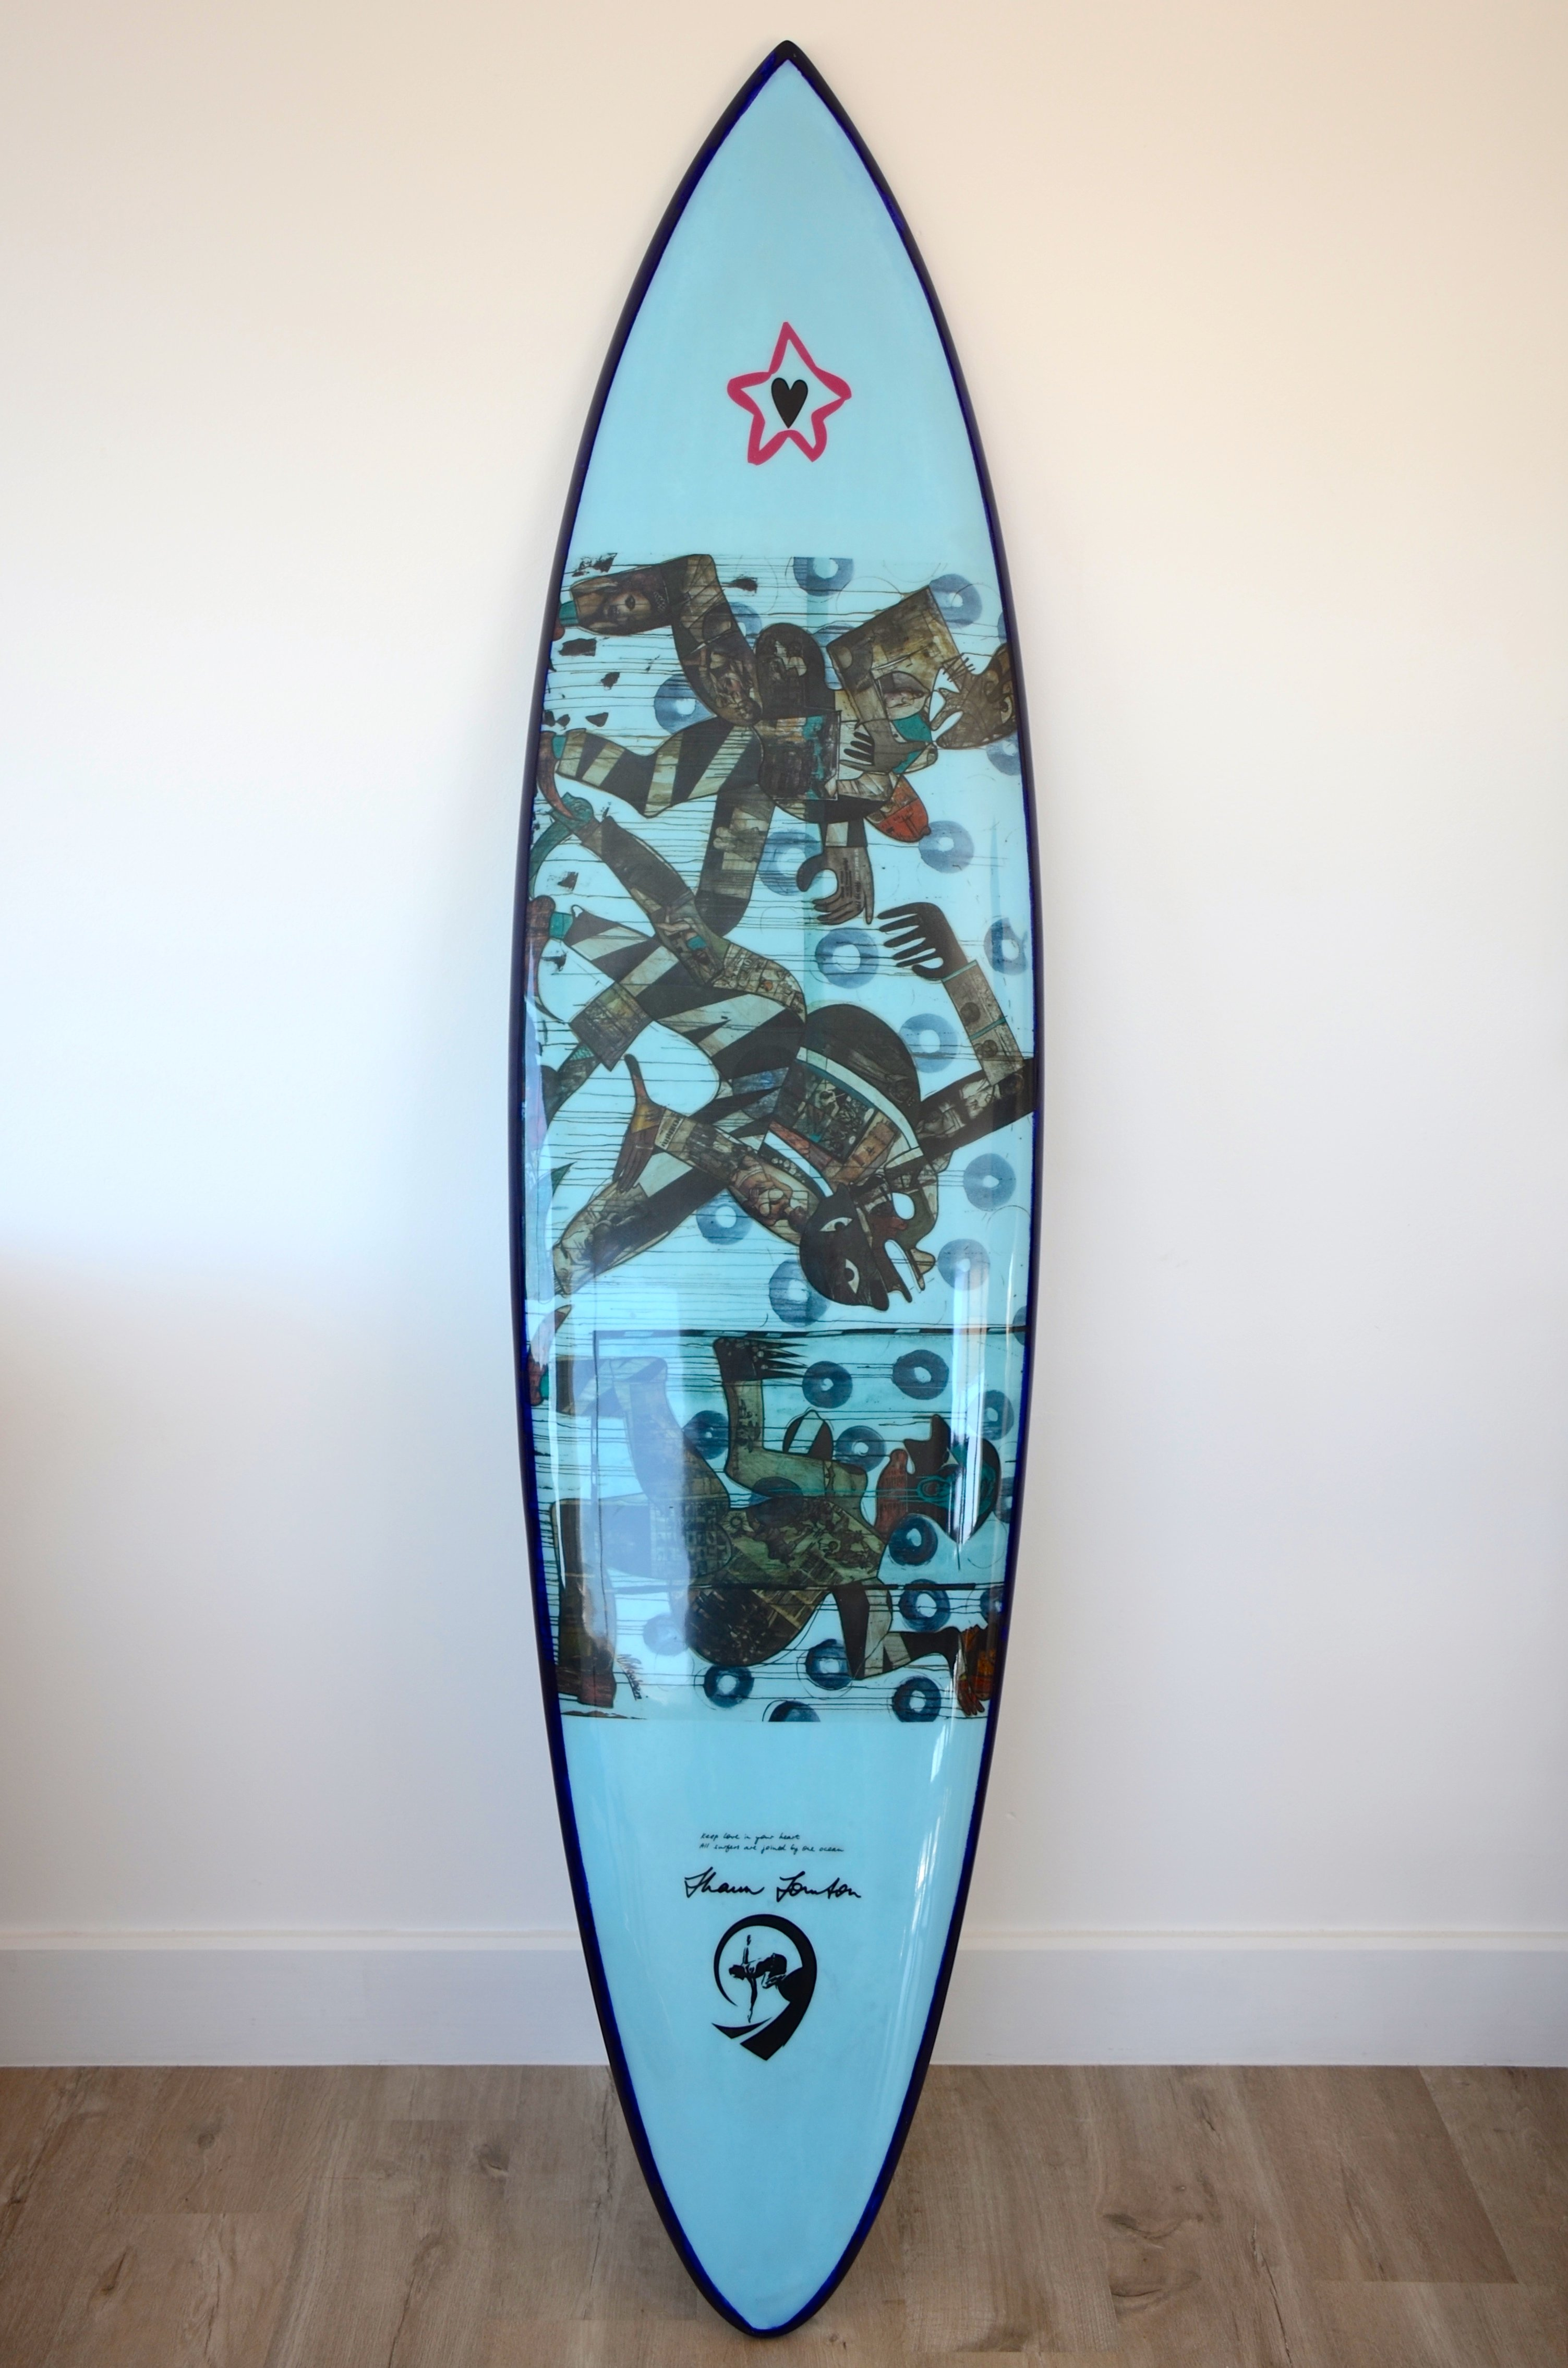 Shaun Tomson limited edition replica surfboard 1